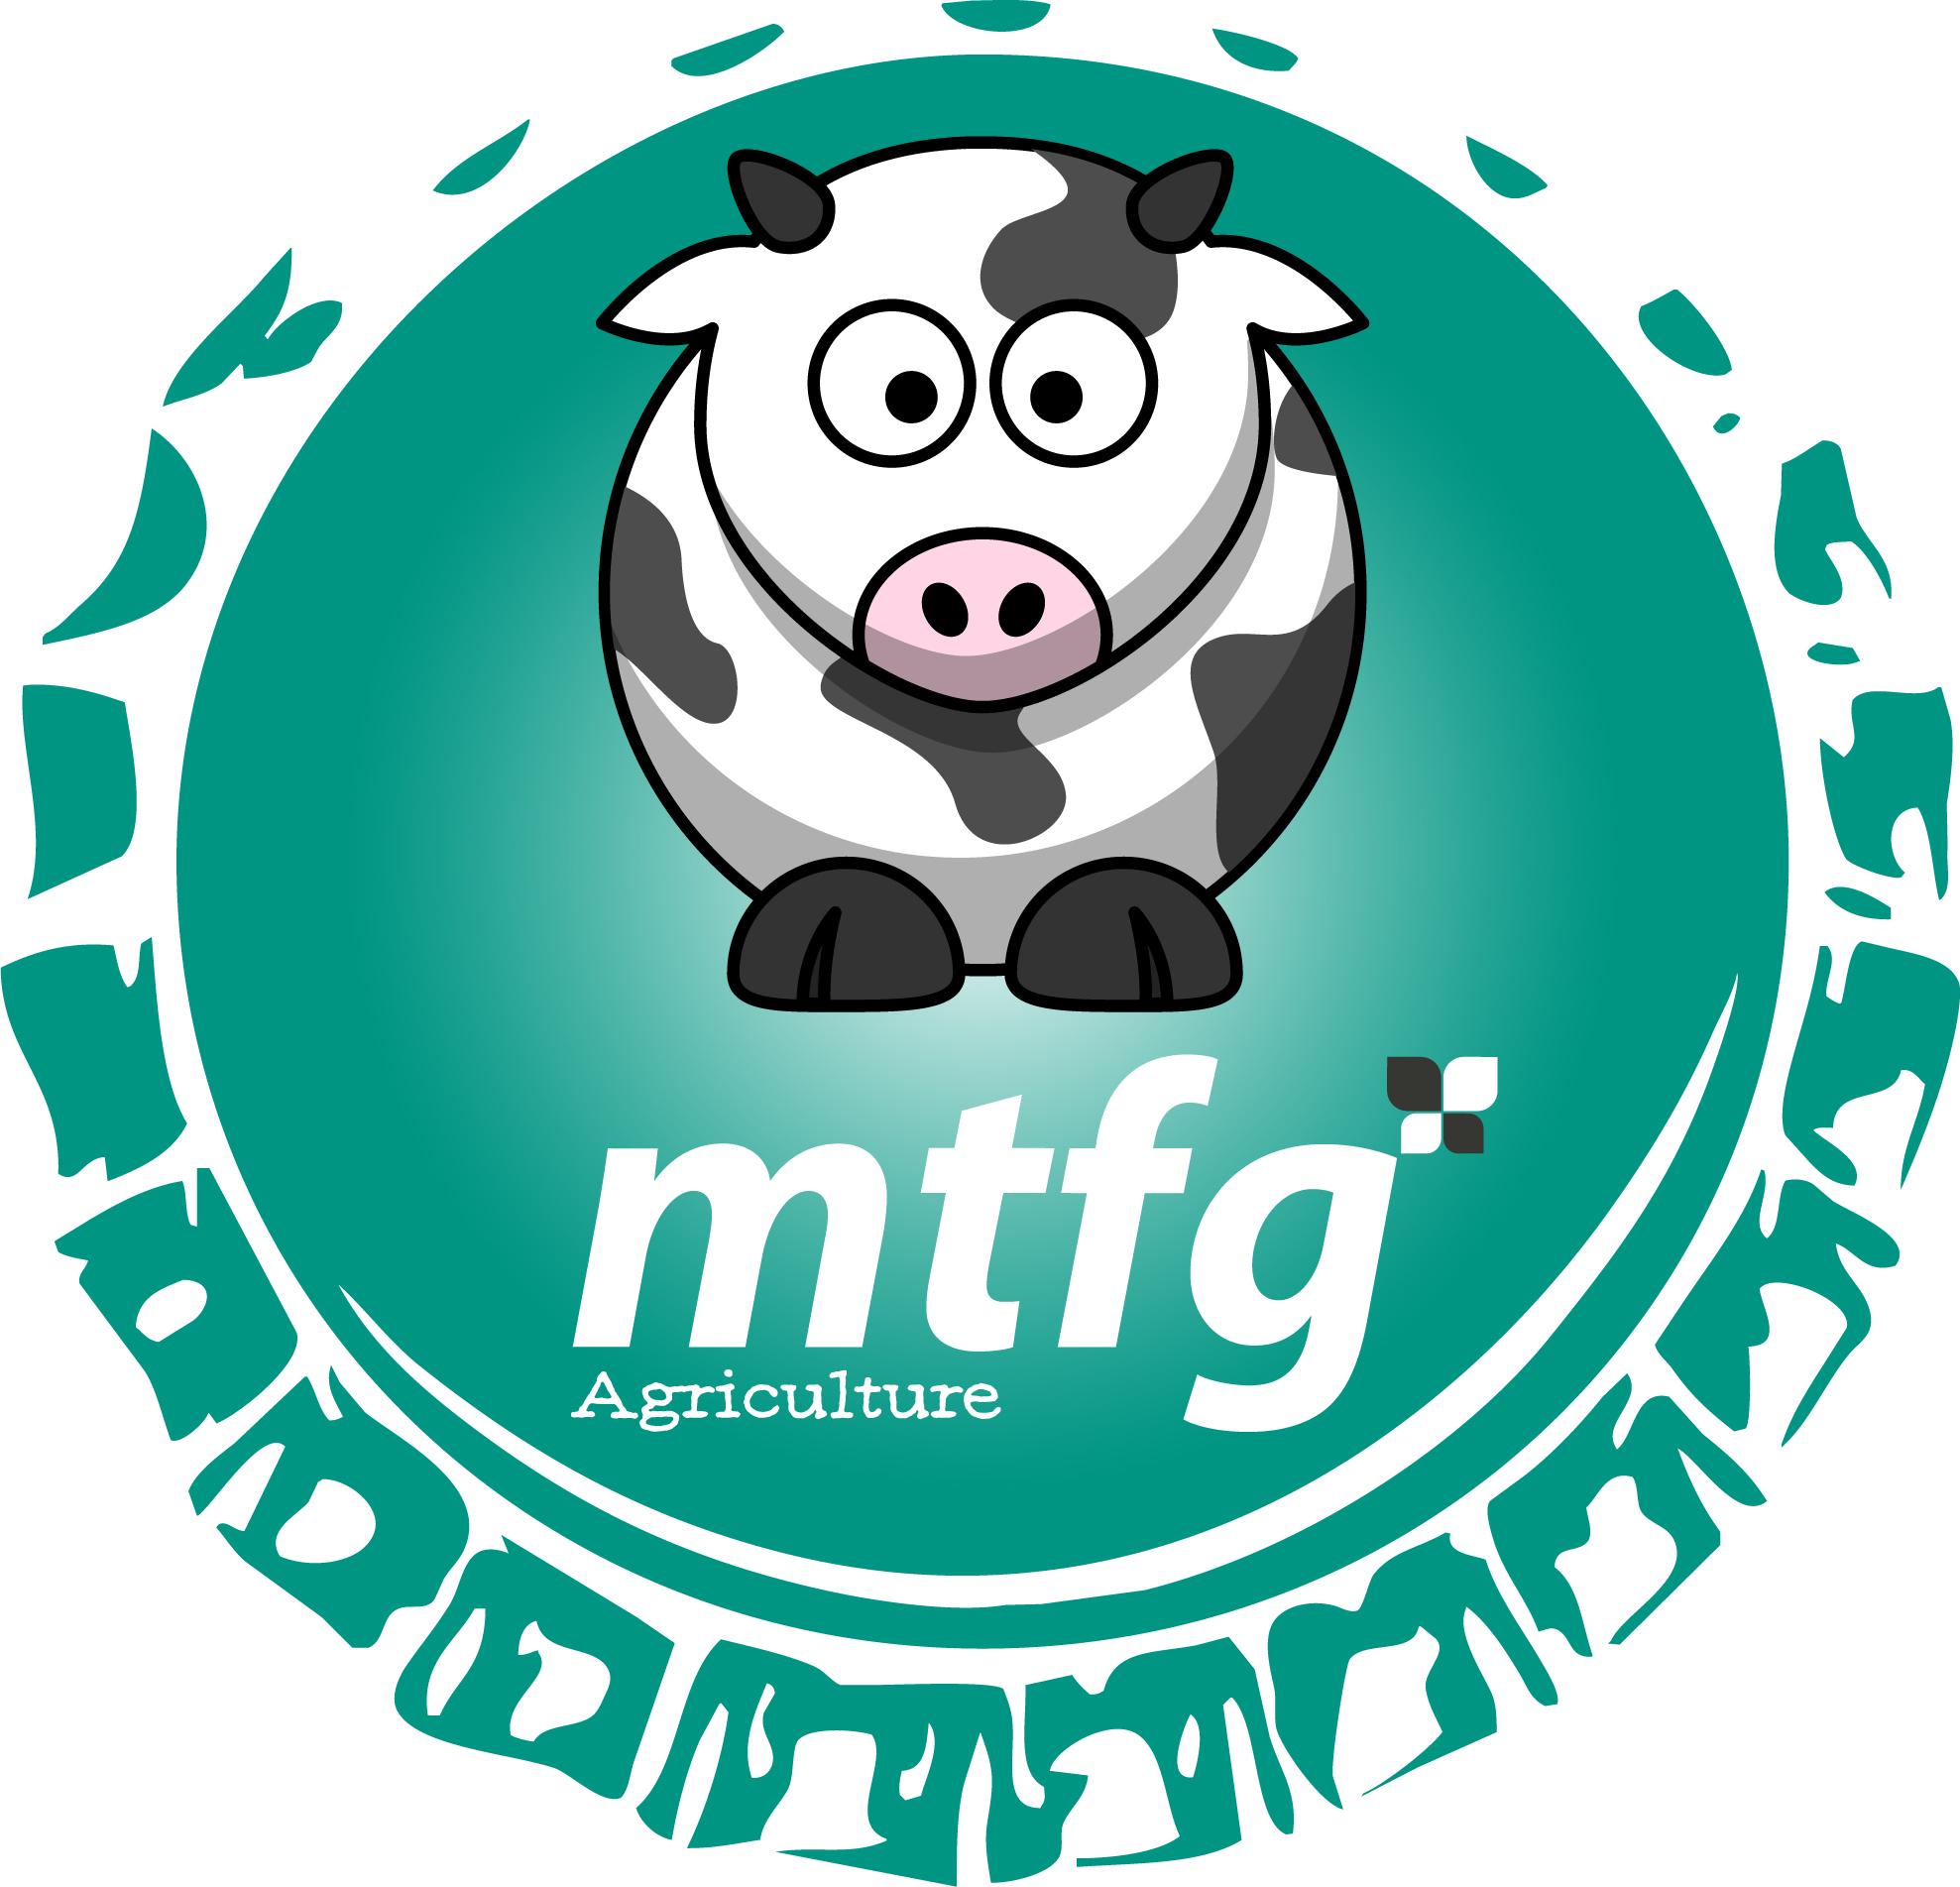 MTFG Agriculture